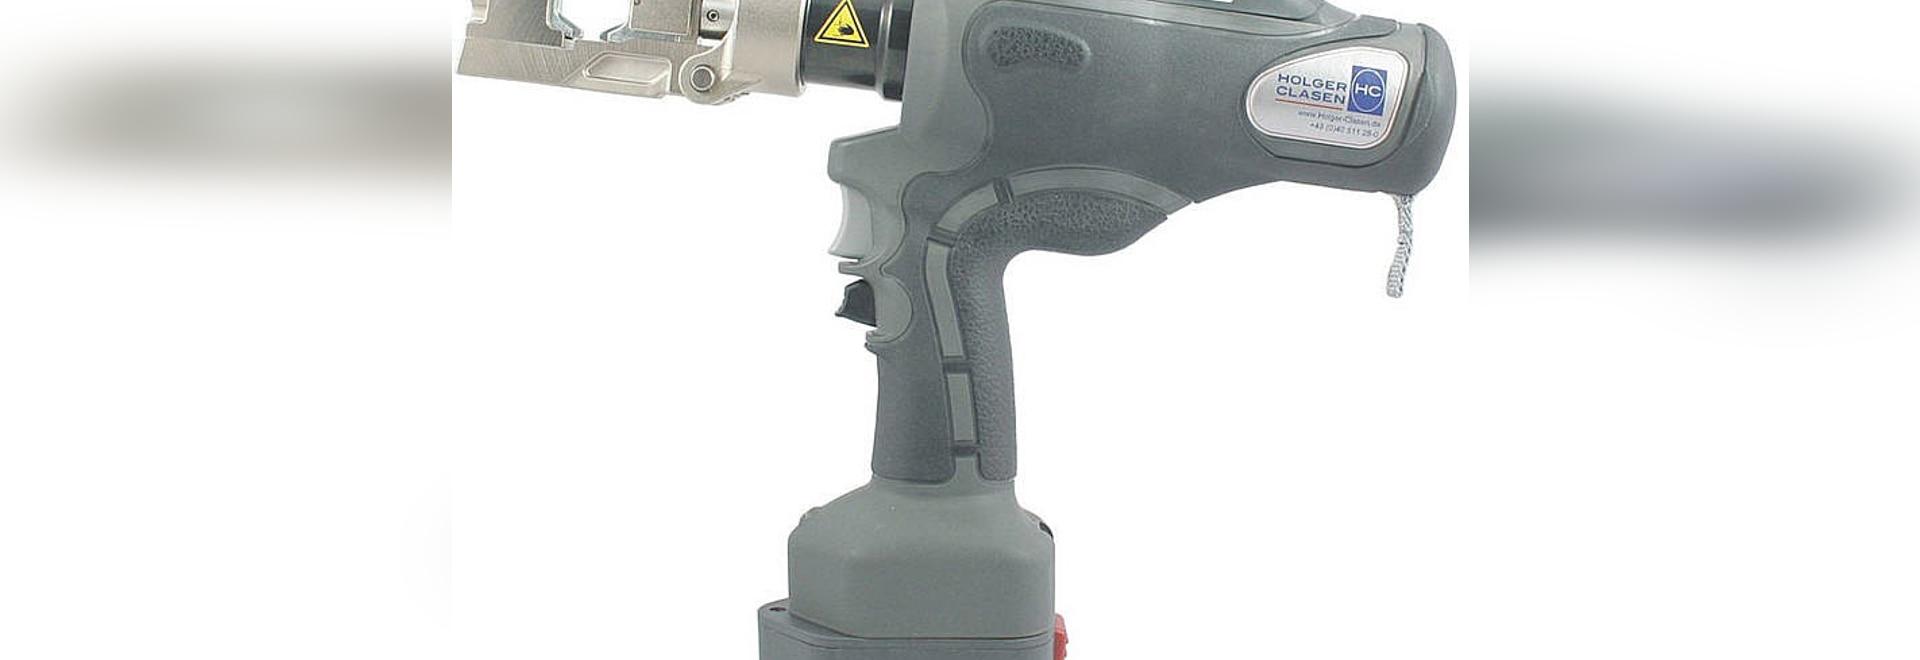 Outil à sertir hydraulique à piles de PressMax® 5